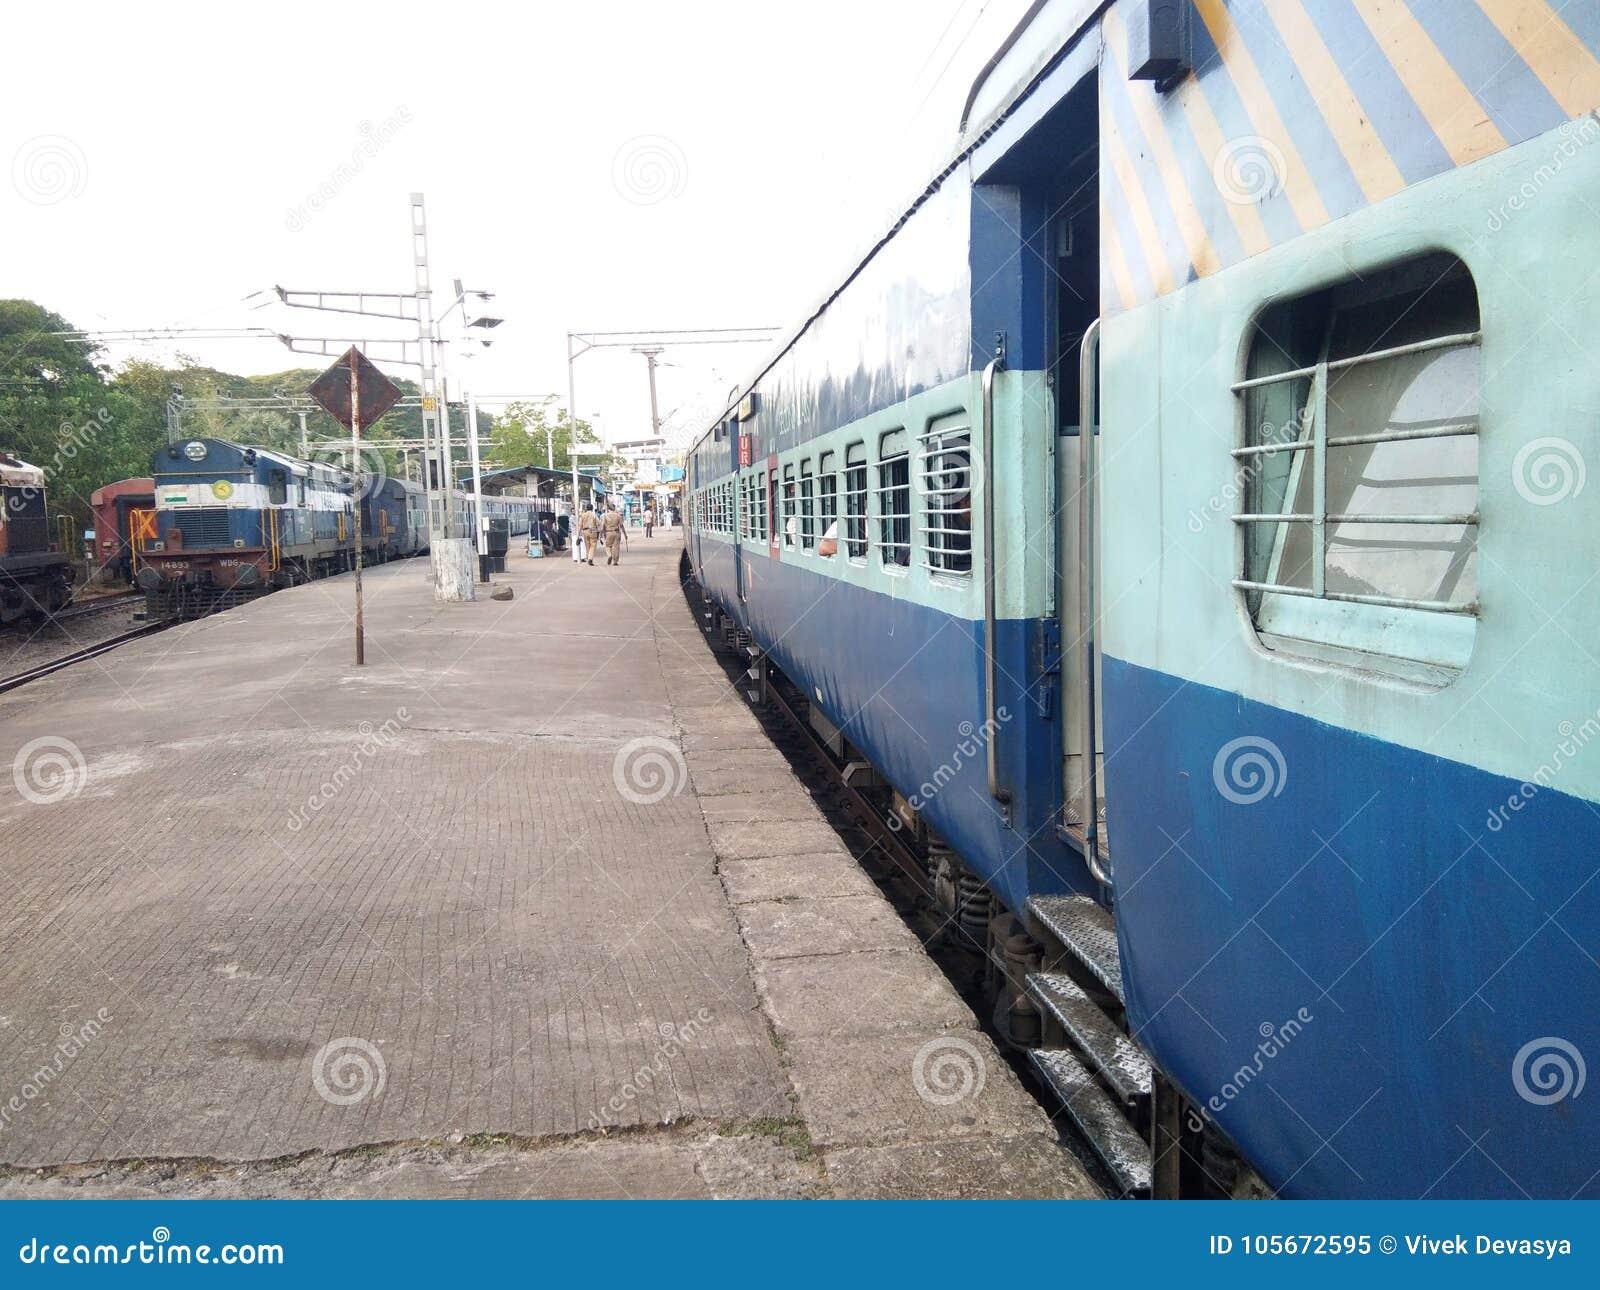 Indian Railway  editorial image  Image of indianrailway